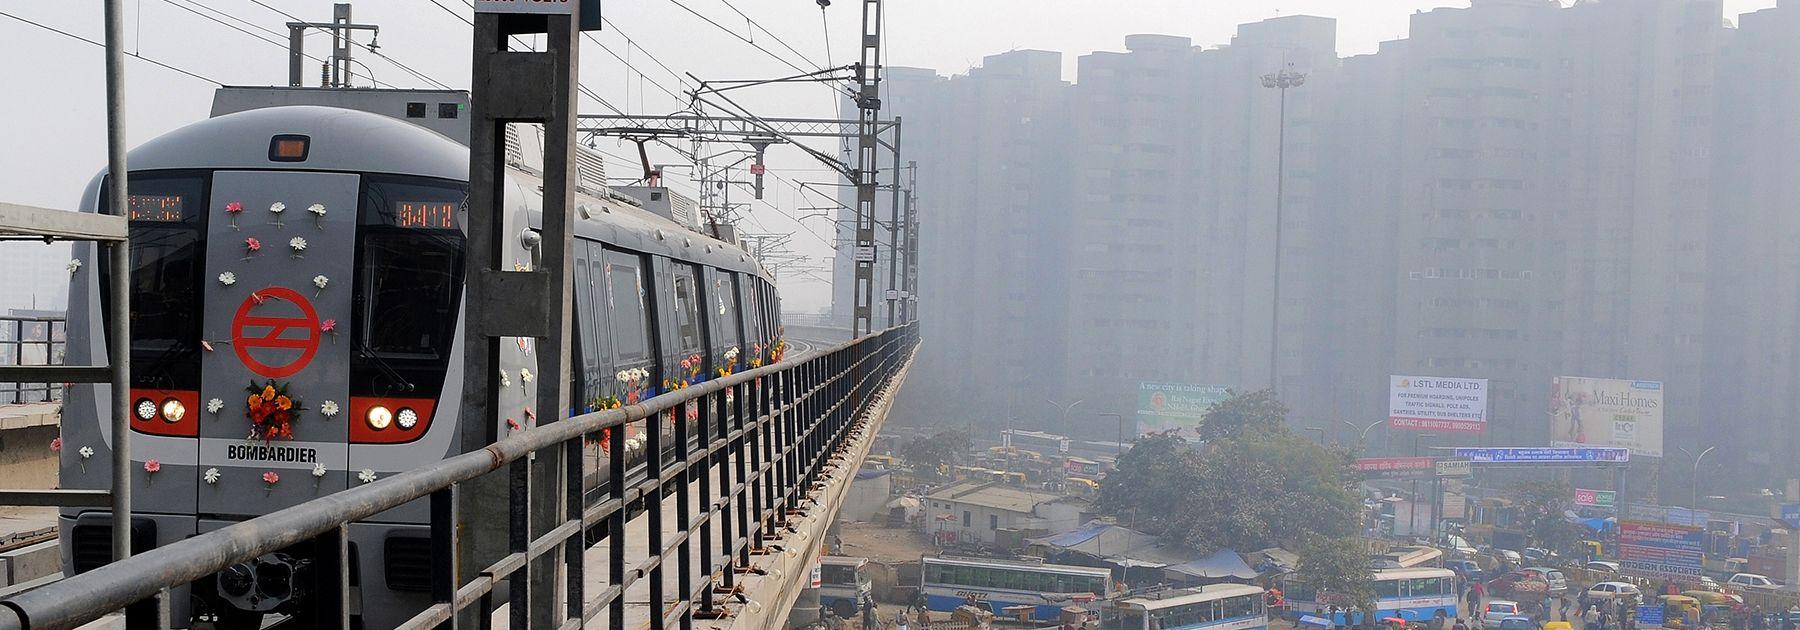 A Delhi Metro train reaches Anand Vihar station on the Delhi-Uttar Pradesh border. (PRAKASH SINGH/AFP/Getty Images)